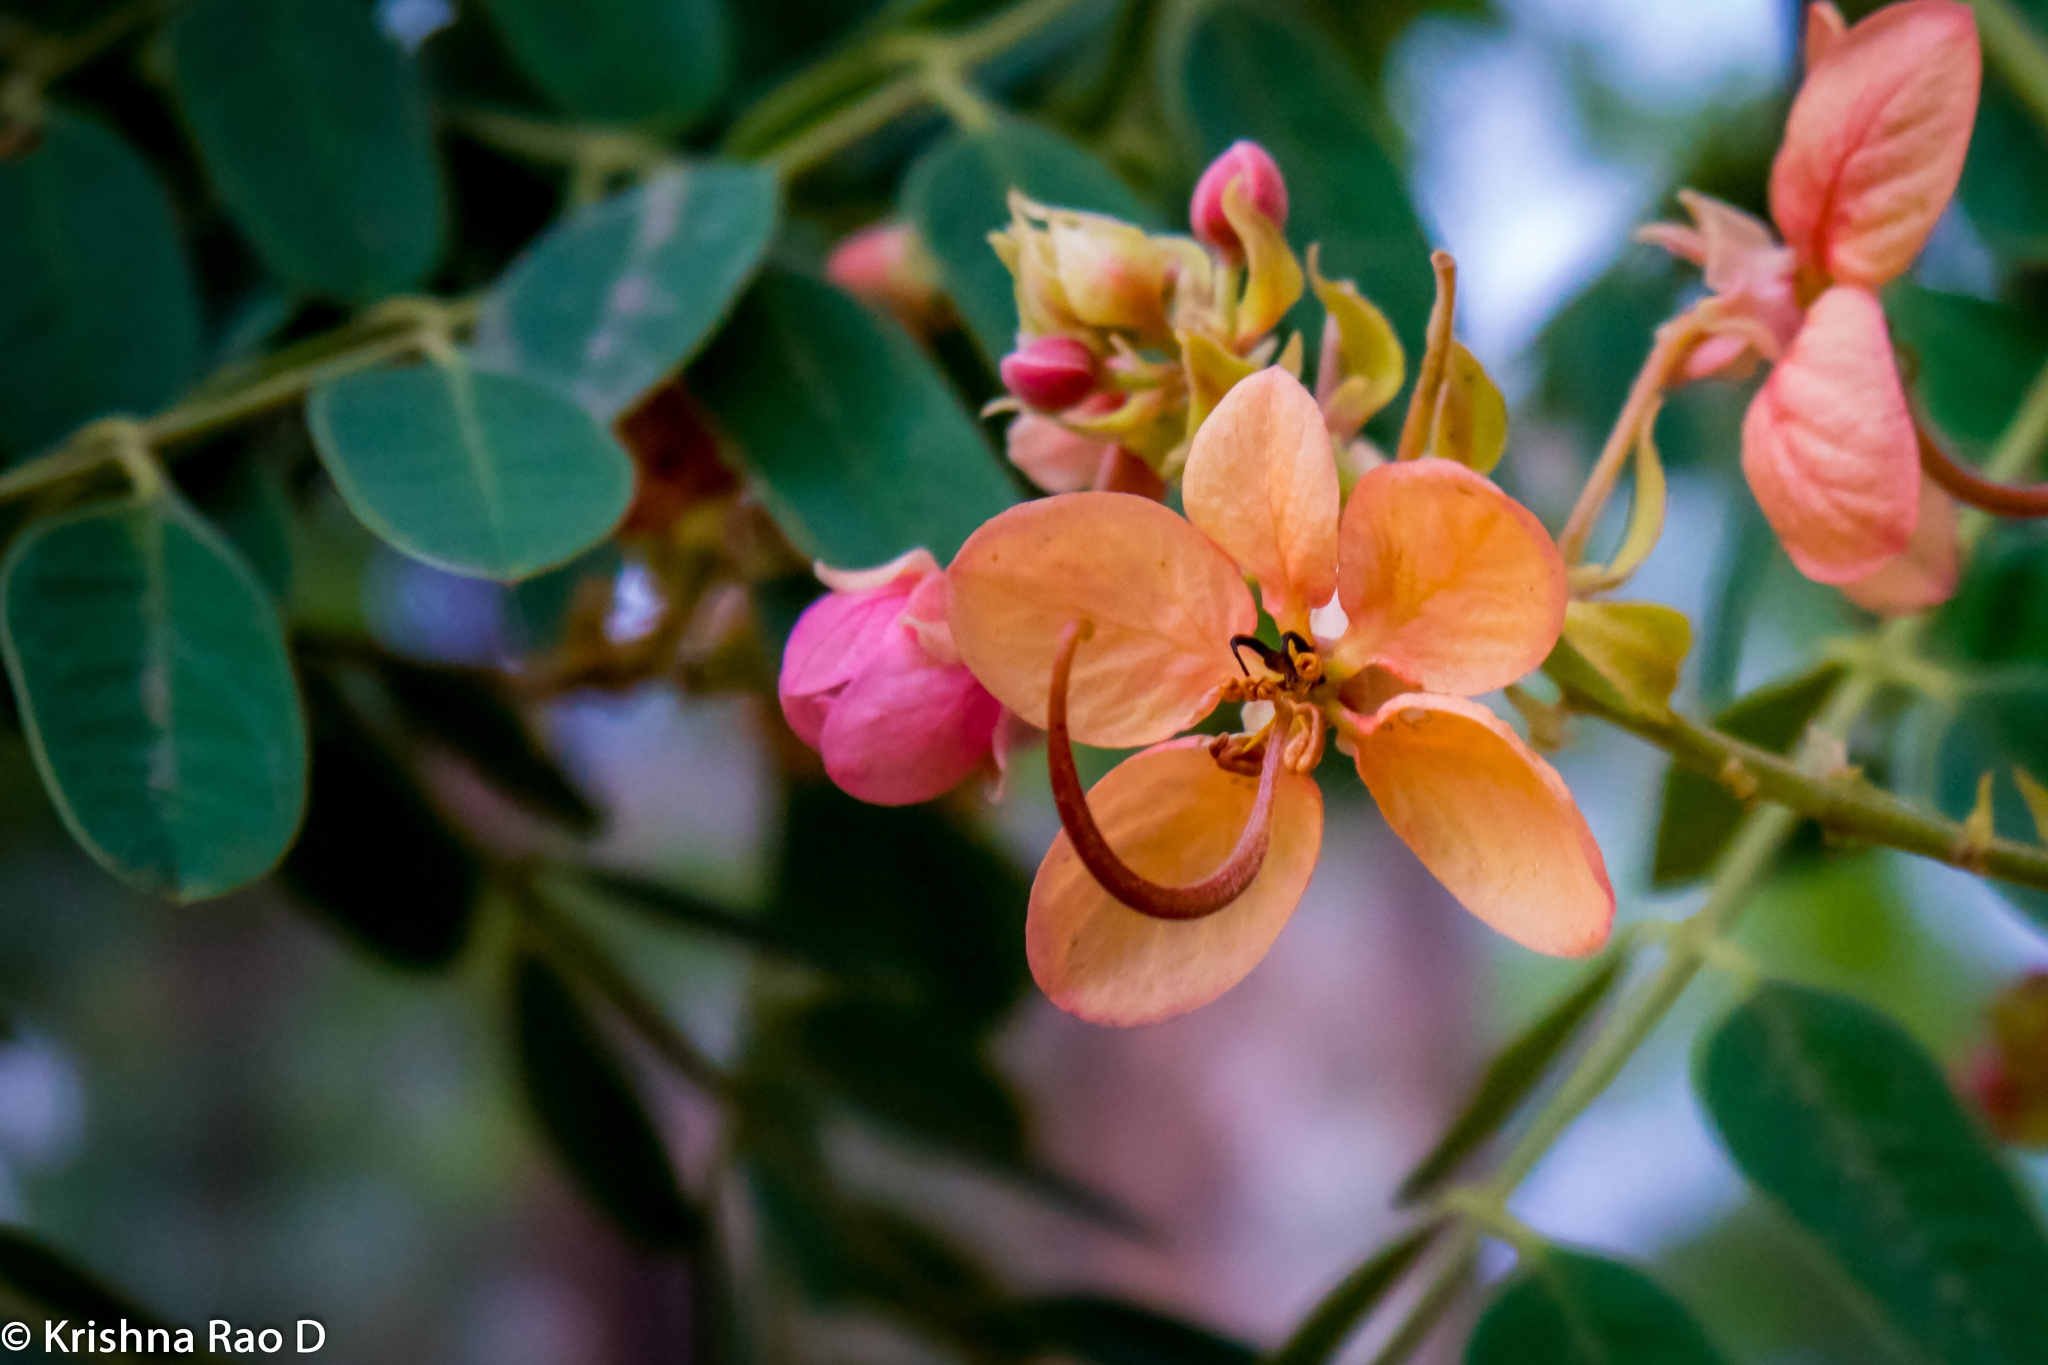 beautiful flowers by Krishna Rao D